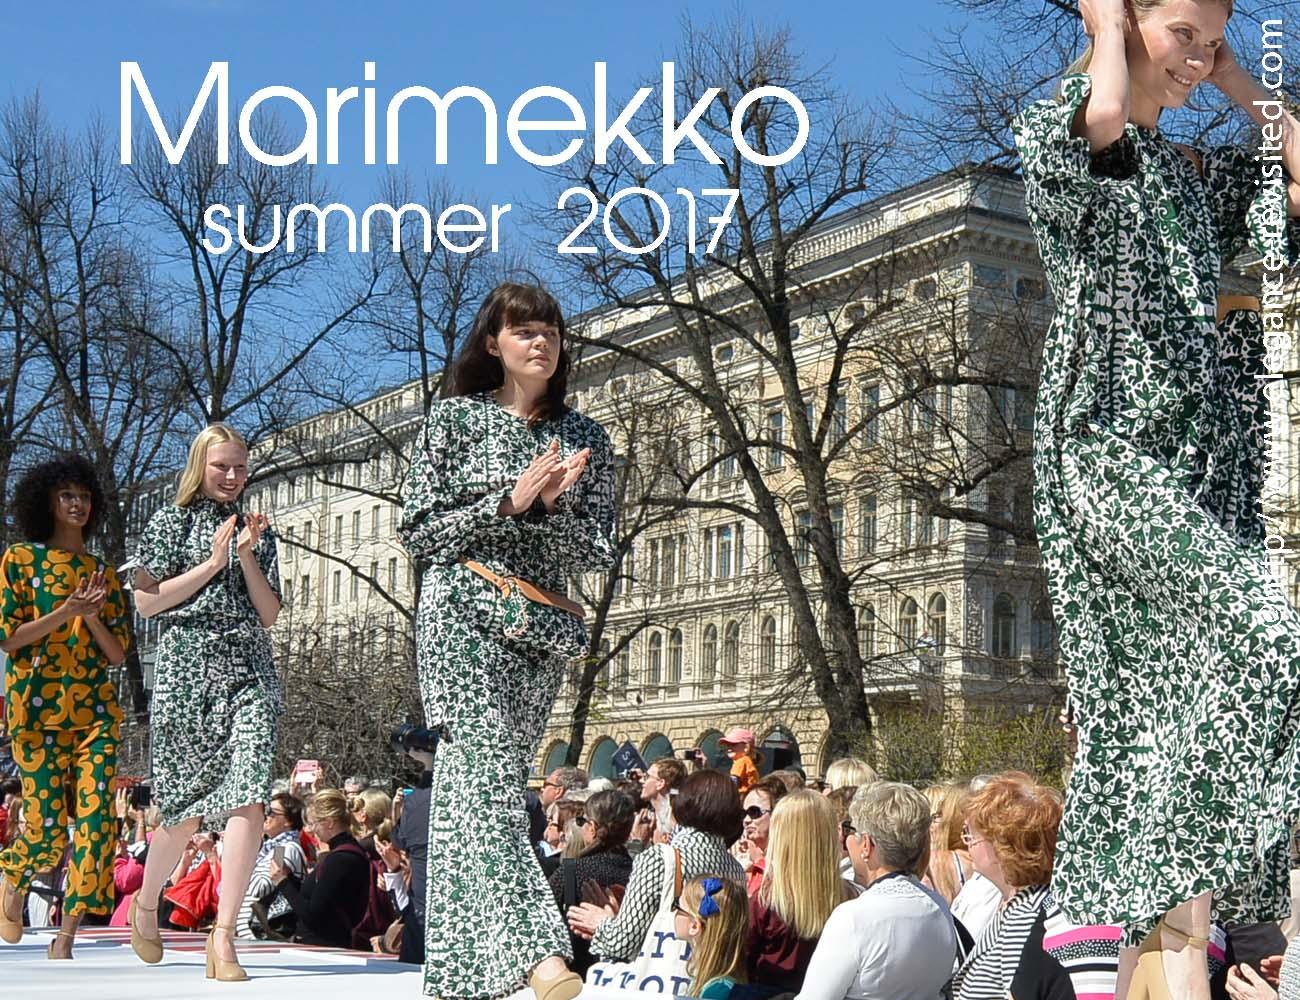 Marimekko summer 2017